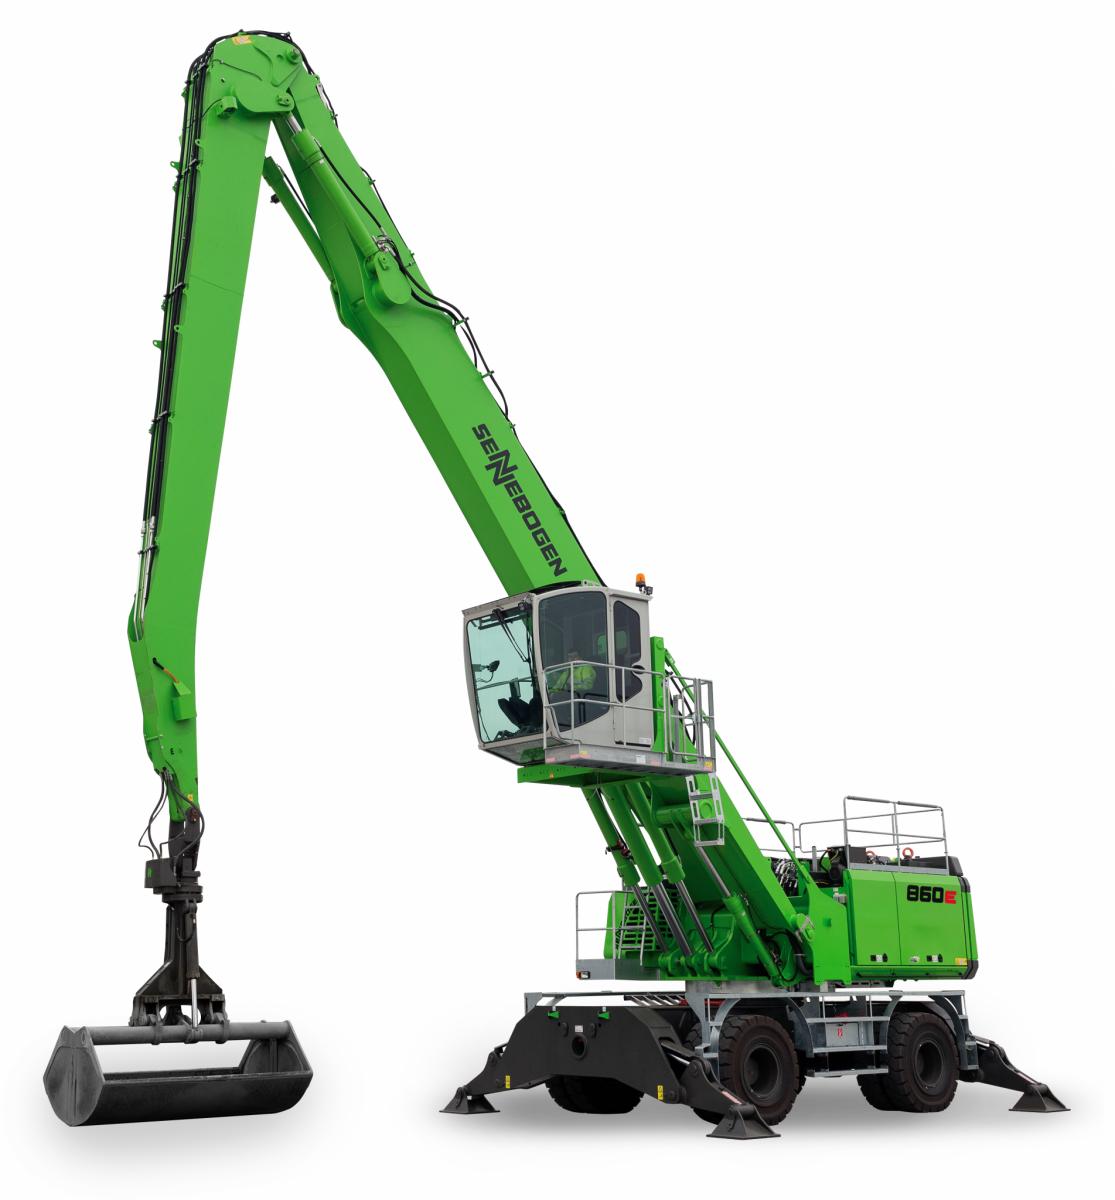 Sennebogen Mobile Material Handling Machine 860E model- SMT